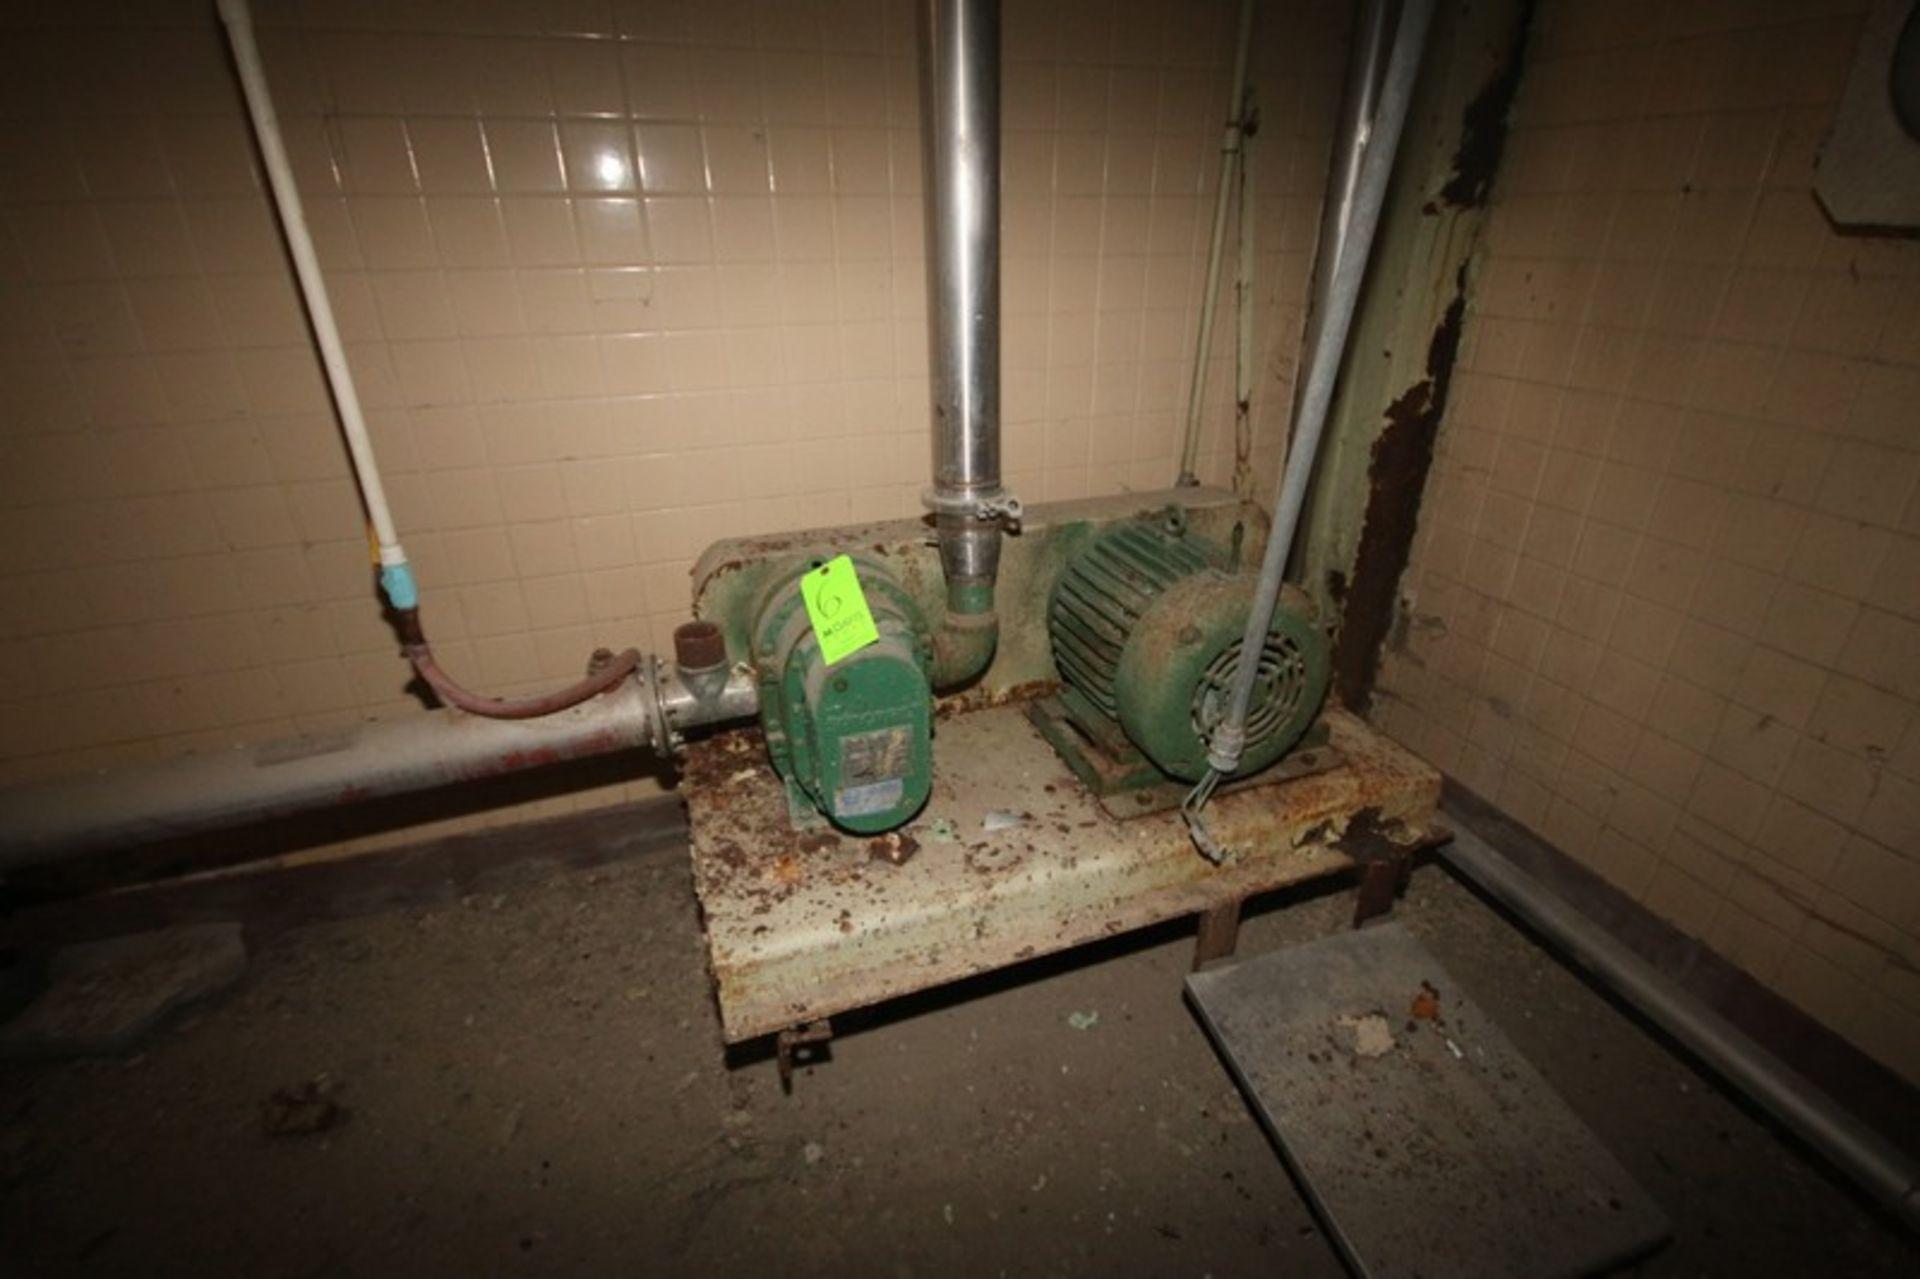 Surtobilt Positive Displacement Blower Vacuum Skid, M/N GAEHBLA, S/N 4453 (LOCATED IN Muenster, TX)